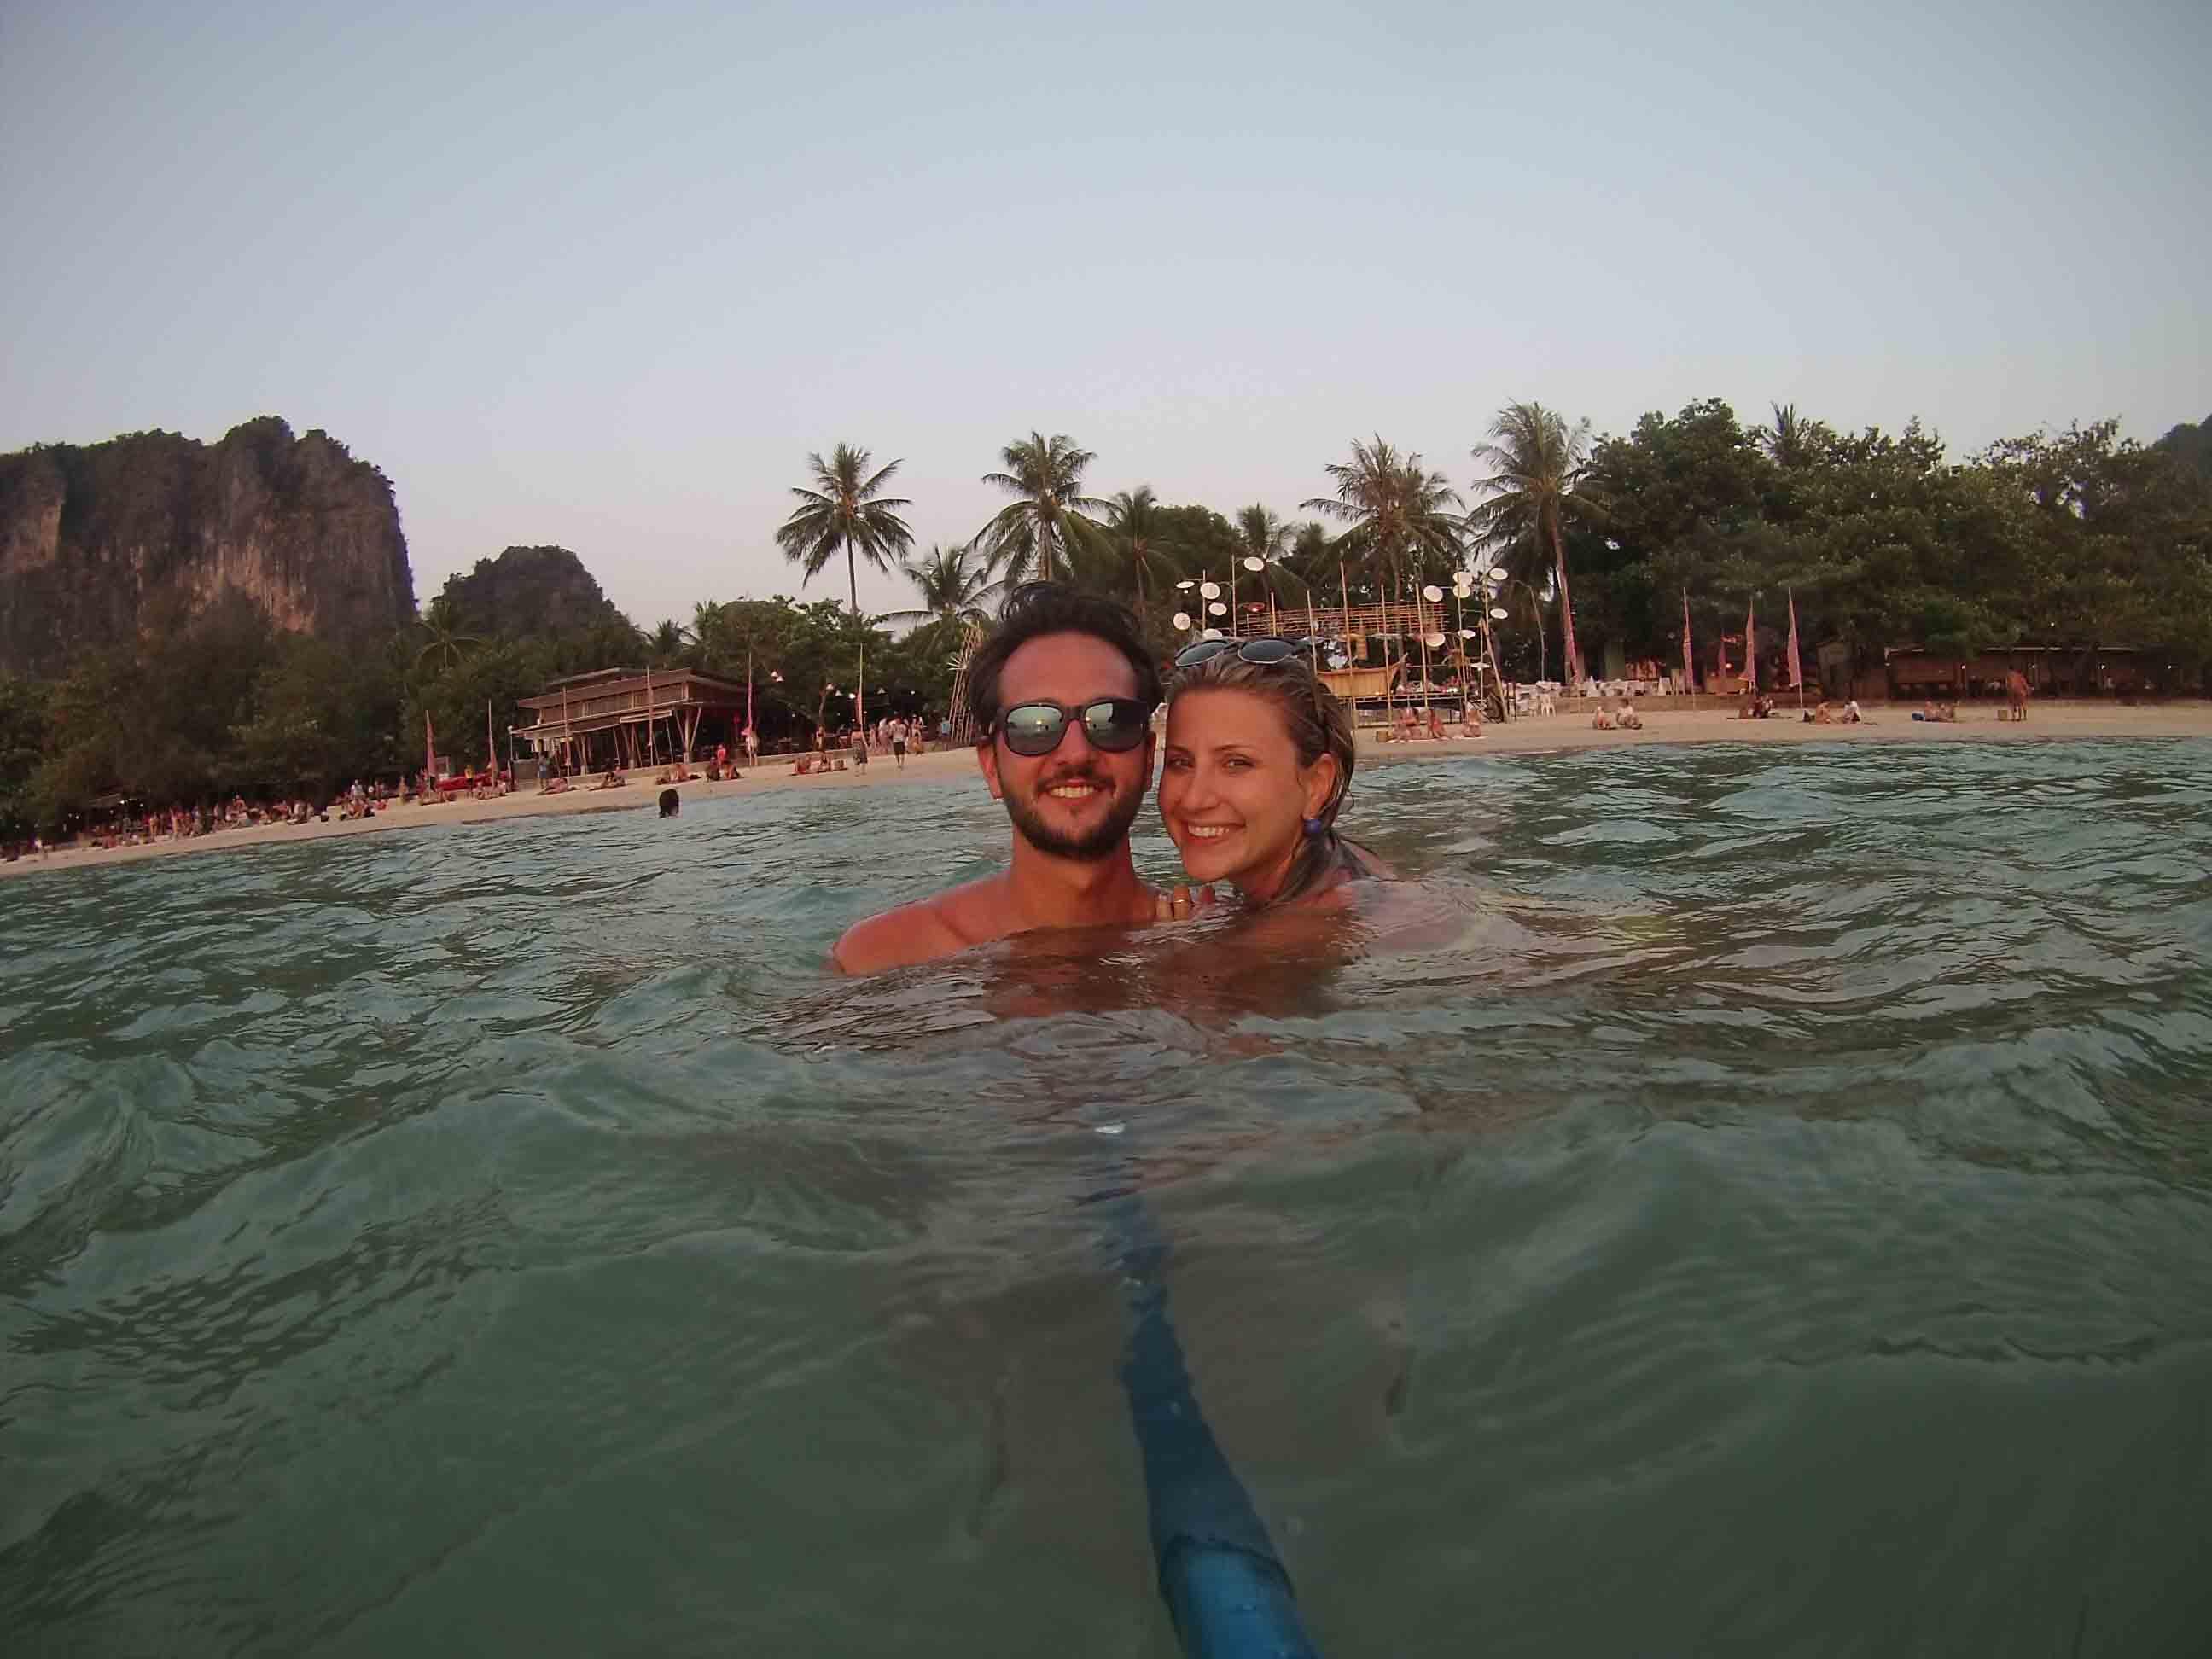 dicas de krabi - railay beach - água quente - hotel rayavadee - tailandia - lala rebelo